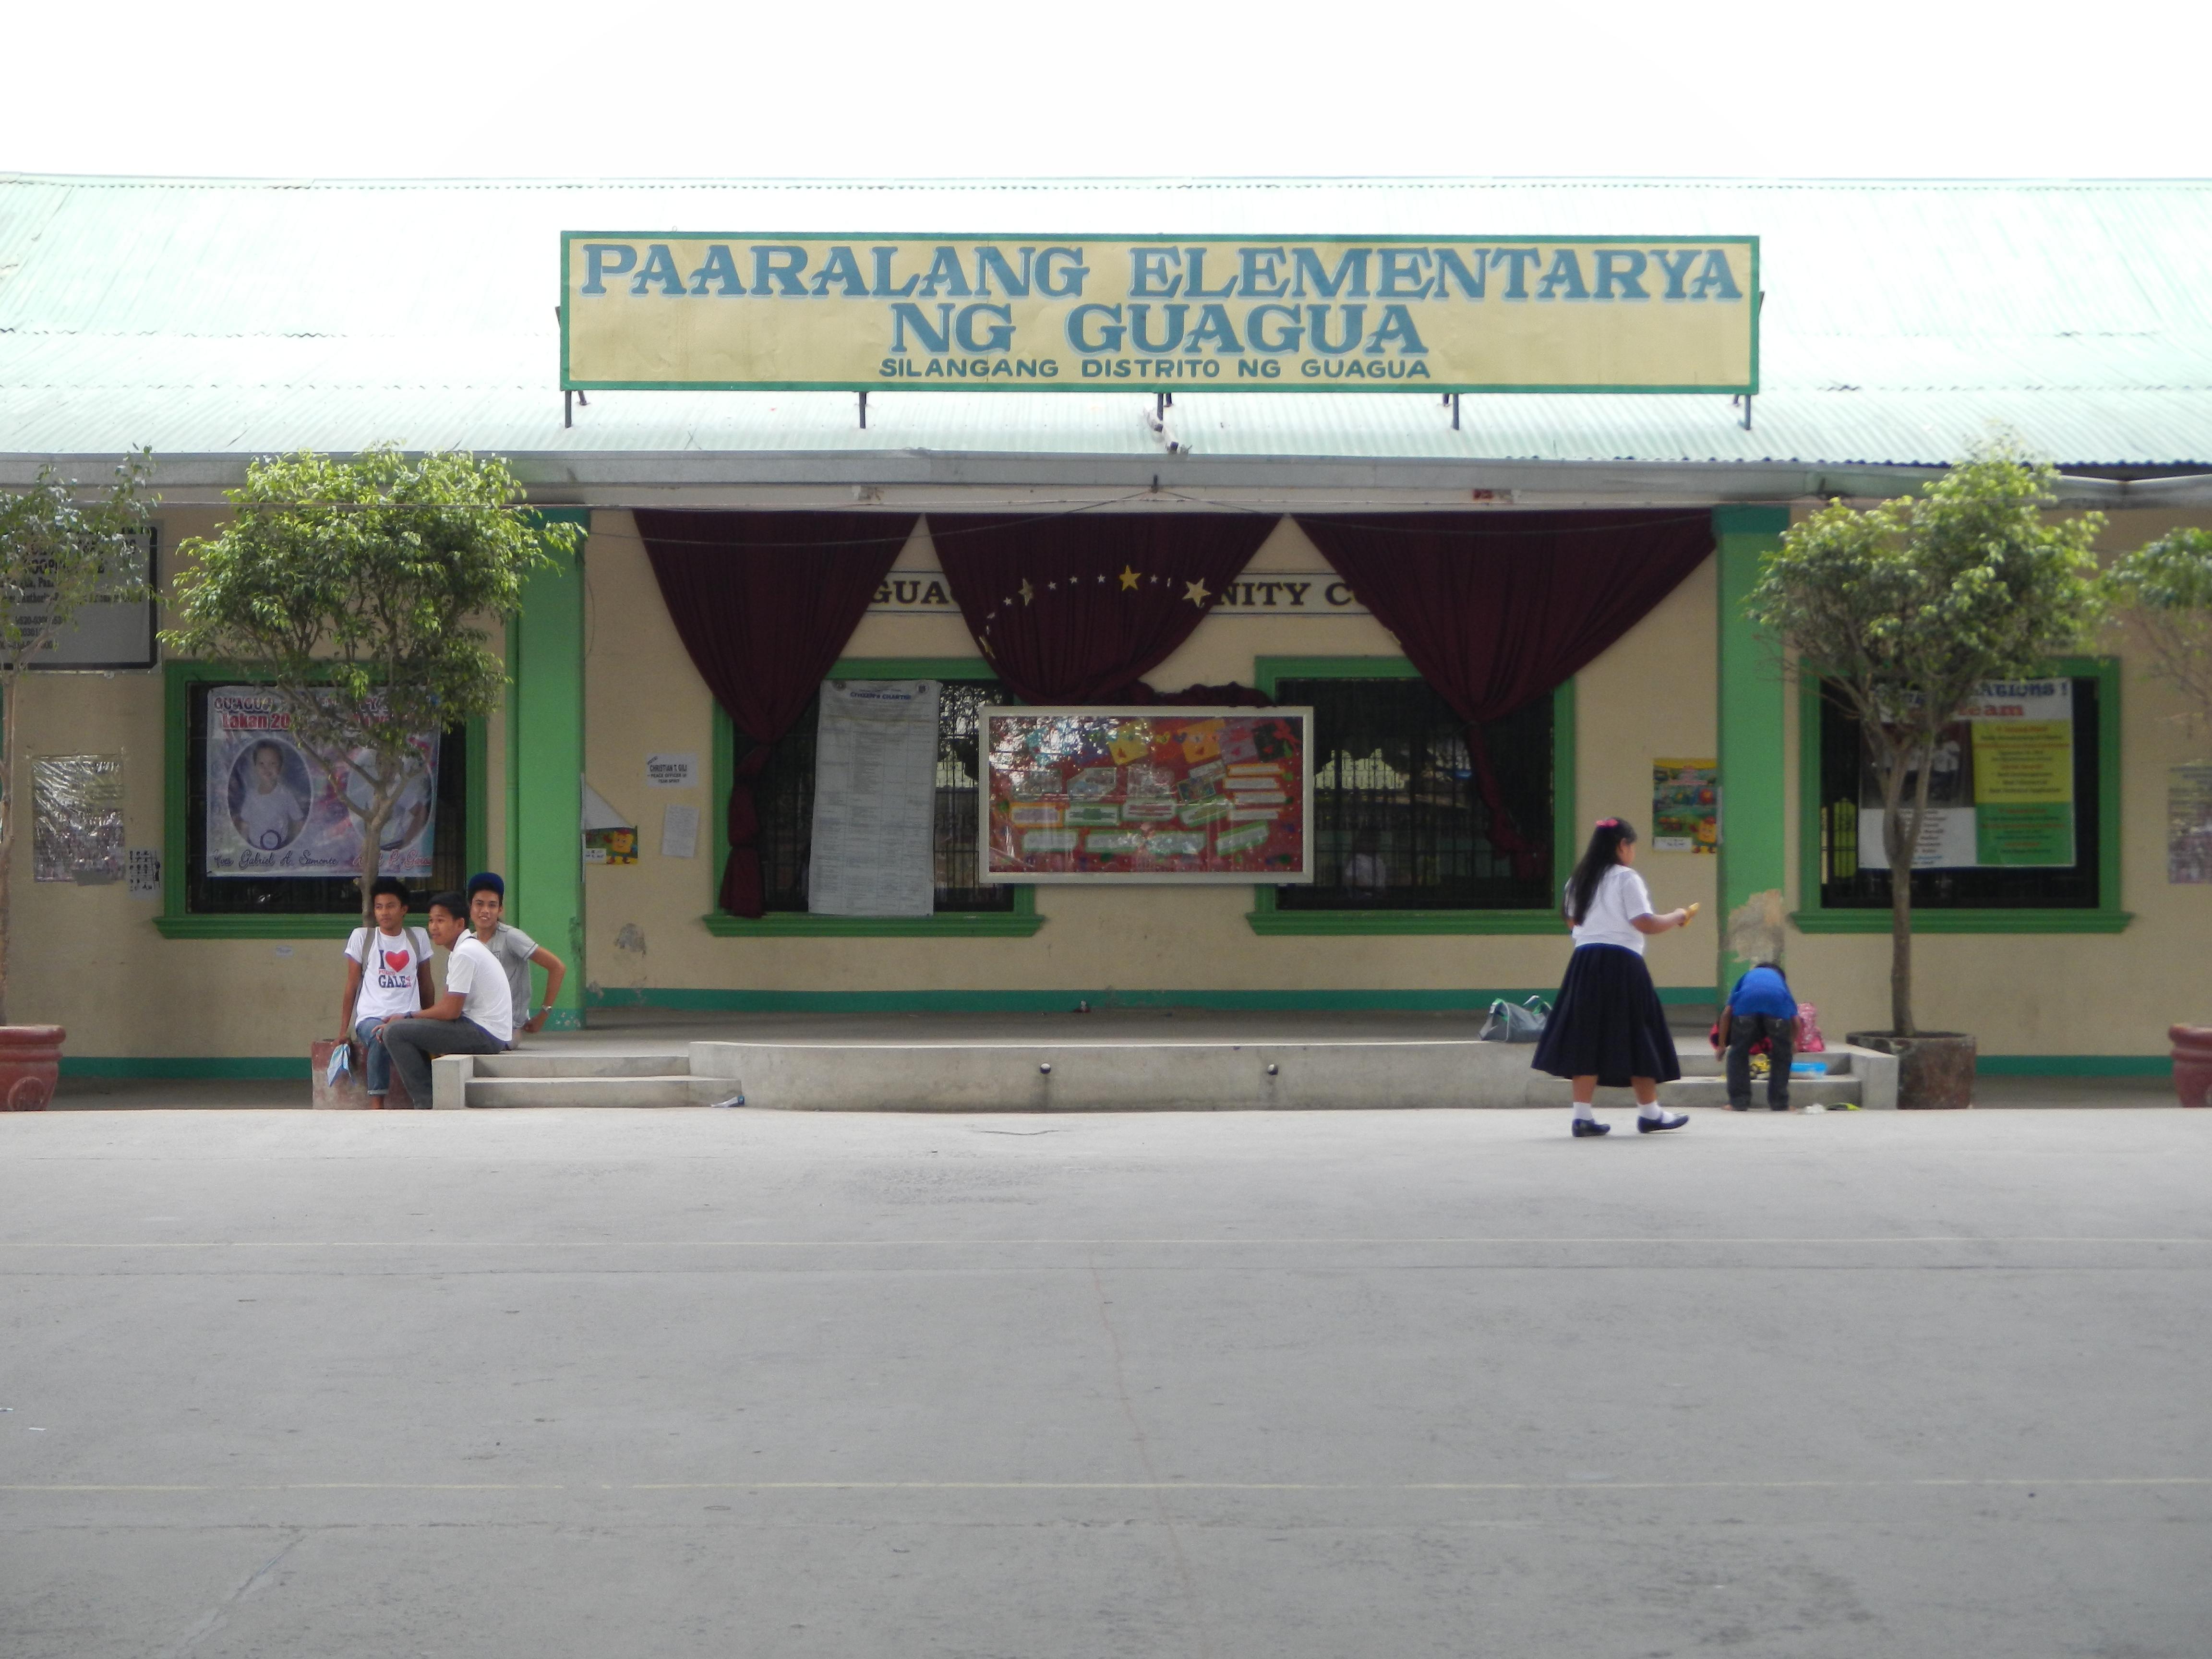 file:jfsanta filomena, guagua, pampanga elementary high schoolfvf 04